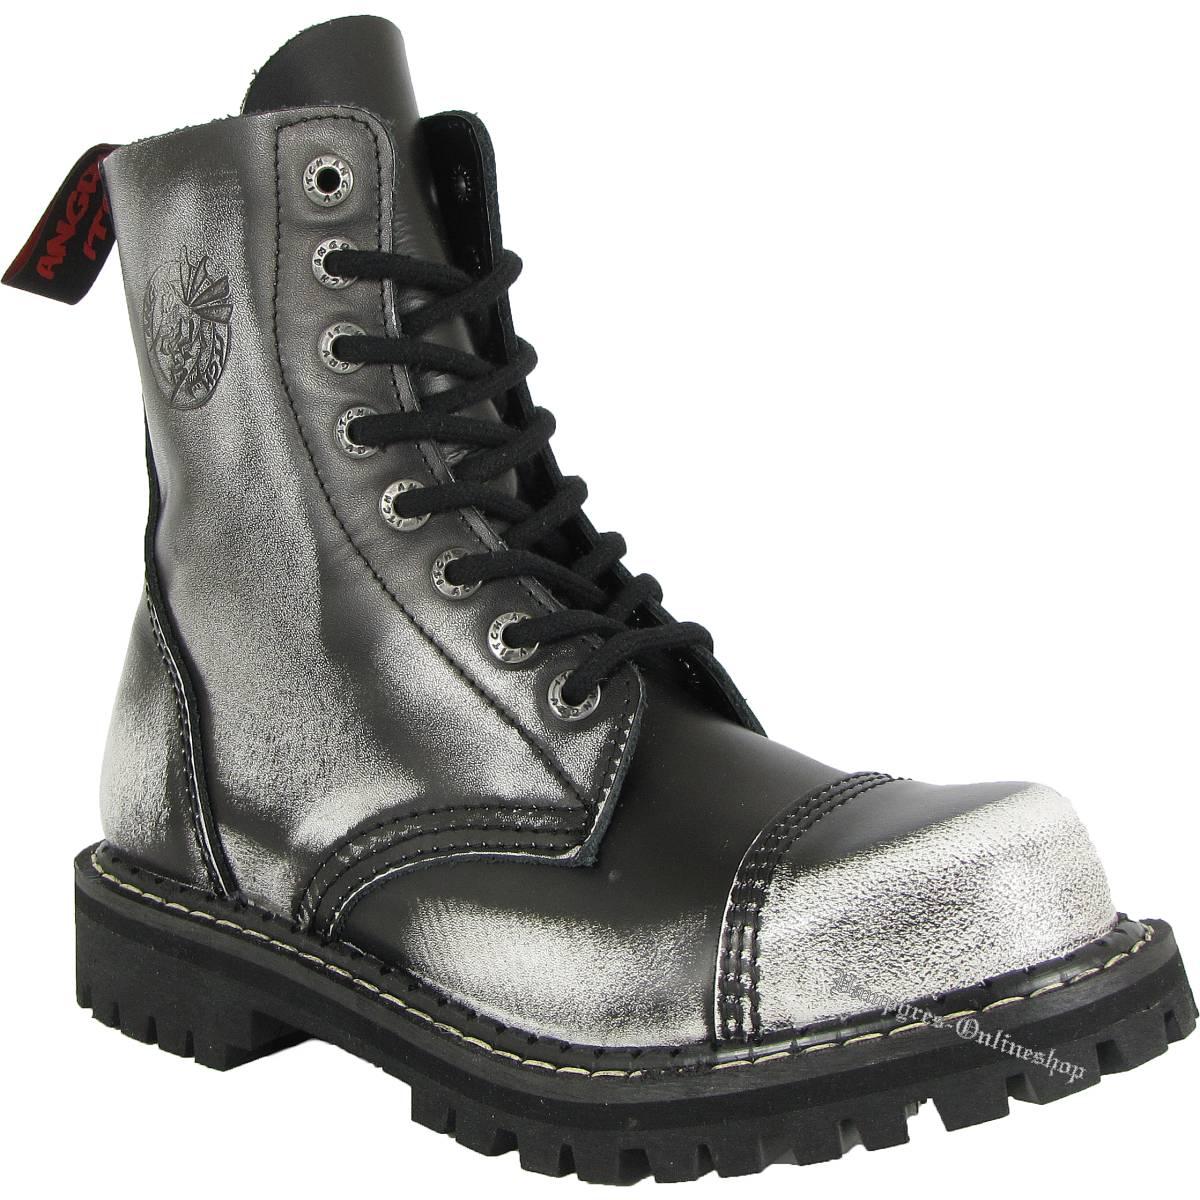 Angry Itch 8-Loch Weiß Schwarz White Rub-Off Rangers Stiefel Schuhe